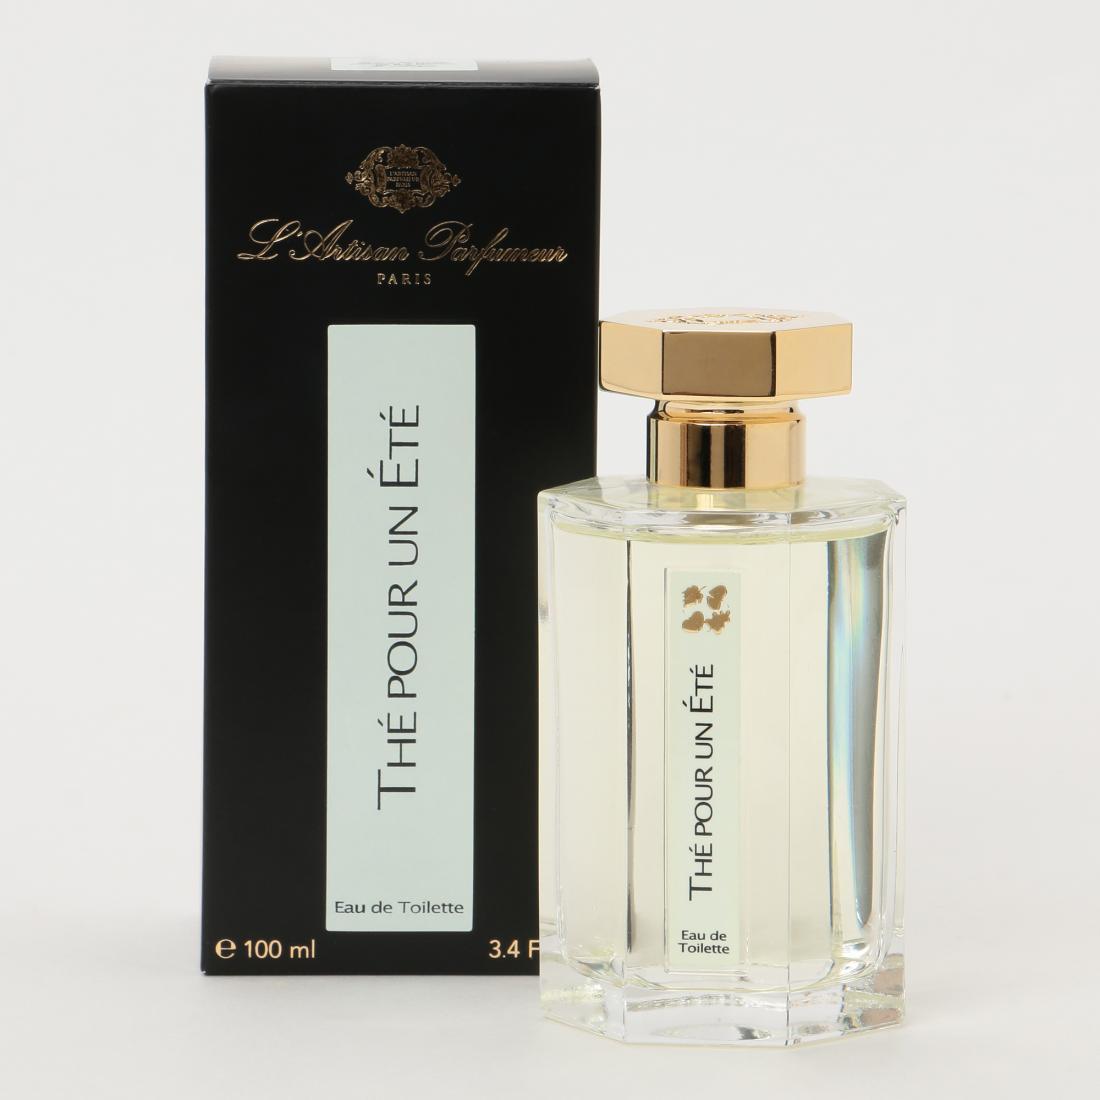 201707_perfume-brand_013